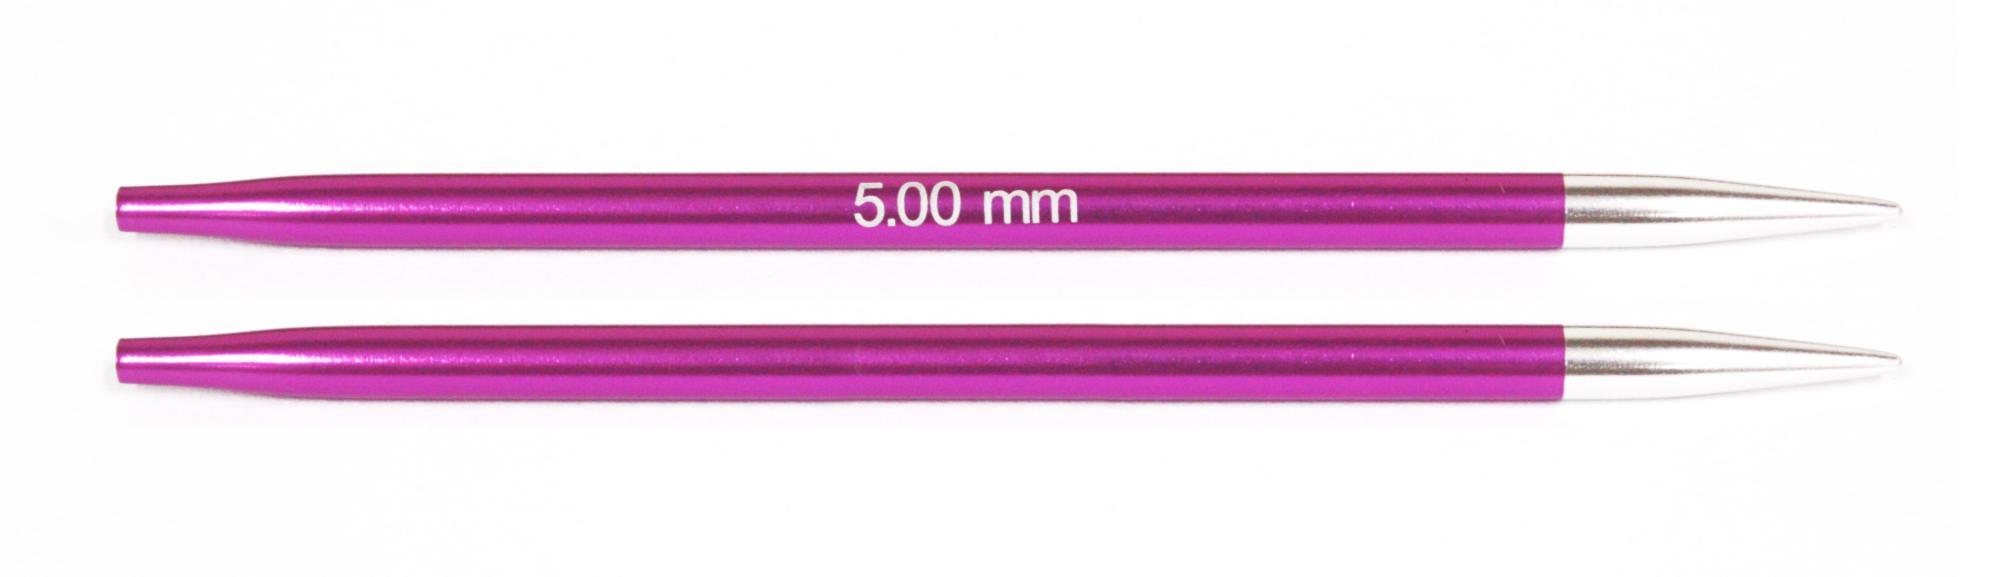 Спицы съемные Zing KnitPro, 47505, 5.00 мм